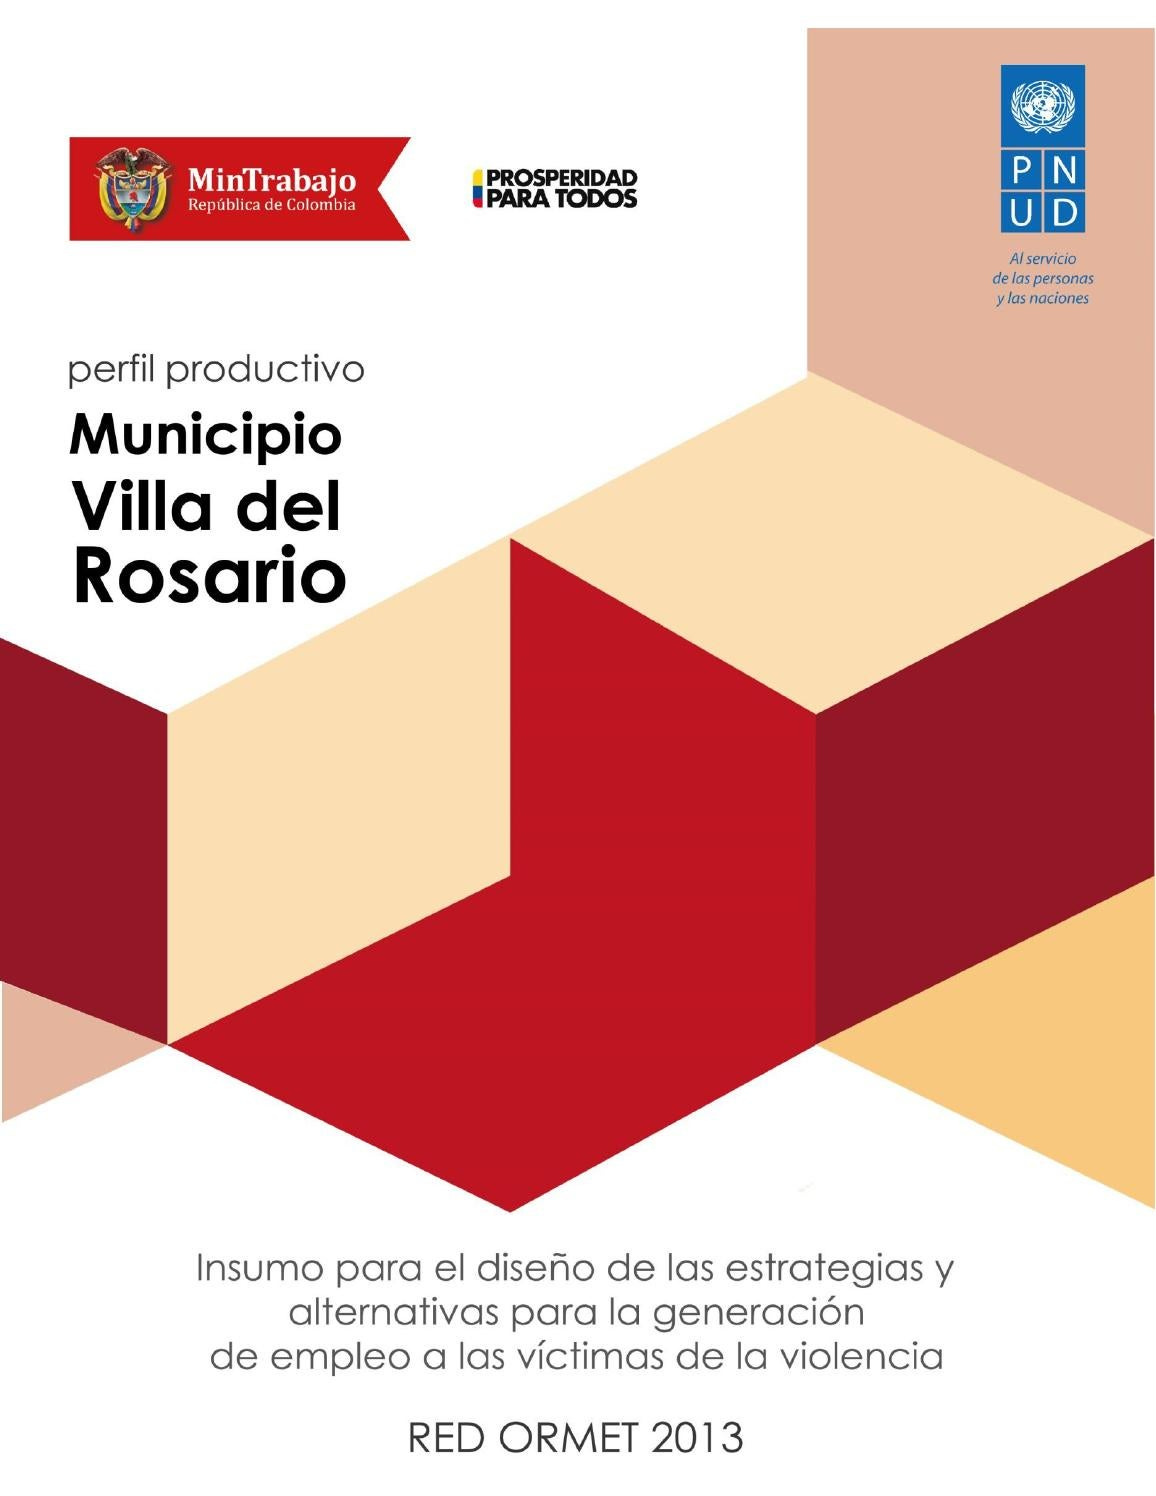 Perfil Productivo Del Municipio Villa Del Rosario By Pnud Colombia  # Muebles Jireh Bucaramanga